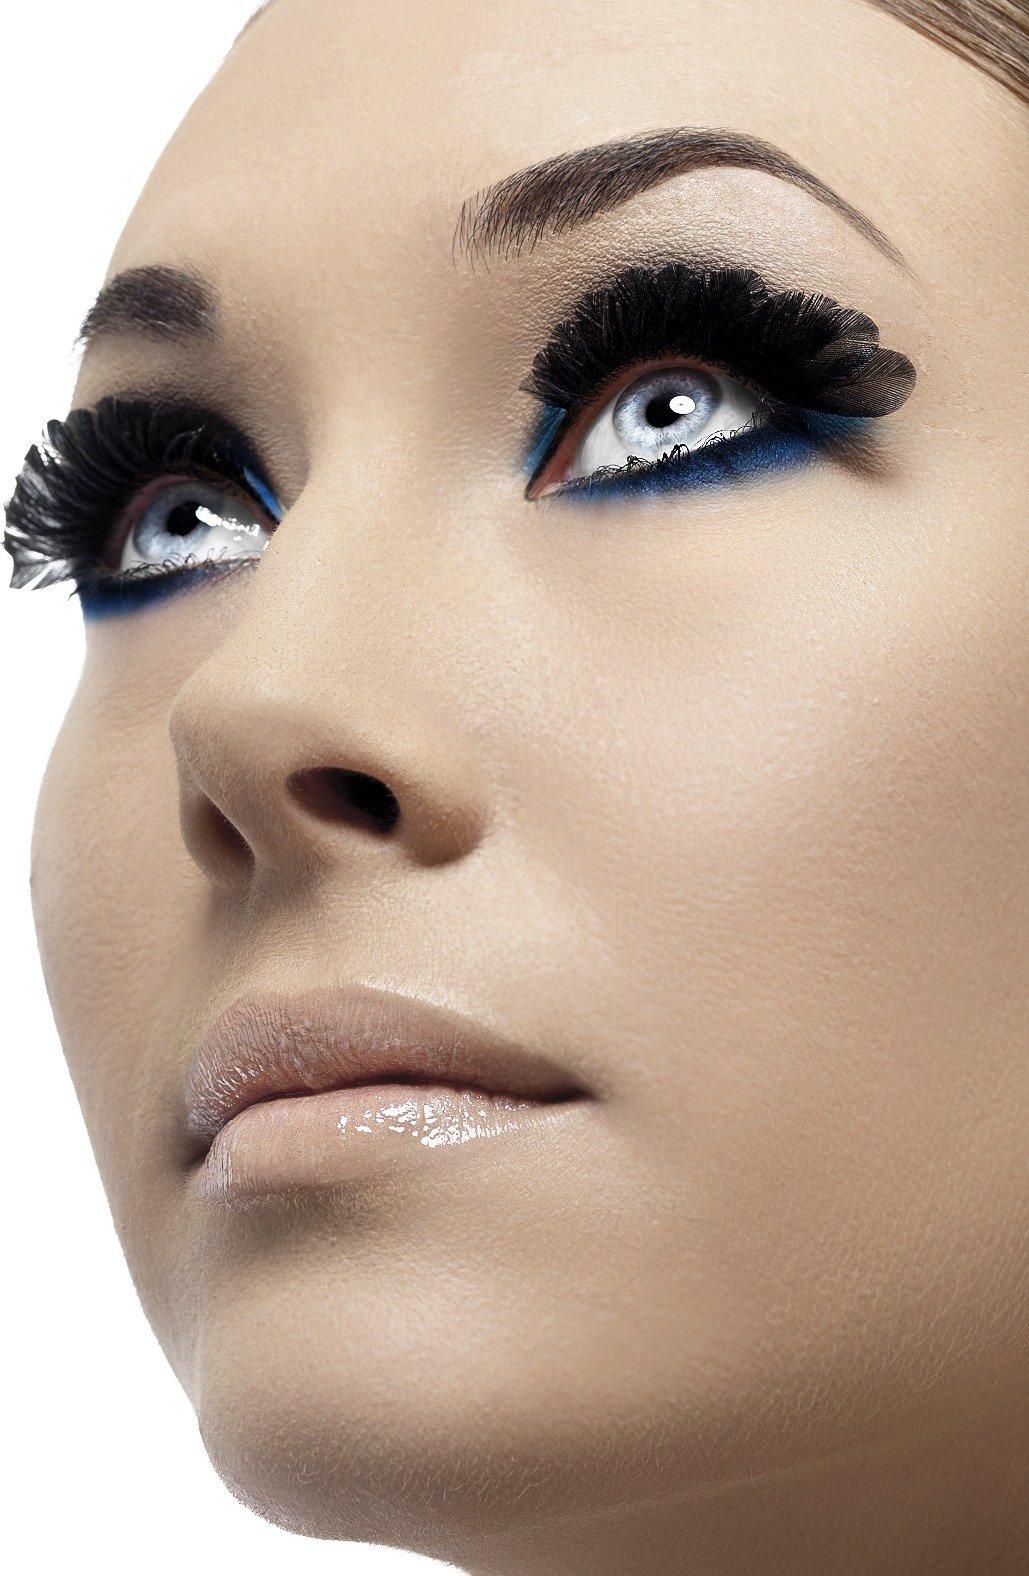 Fever Women's  Eyelashes, Short black feathers, Contains Glue, One Size, 36522